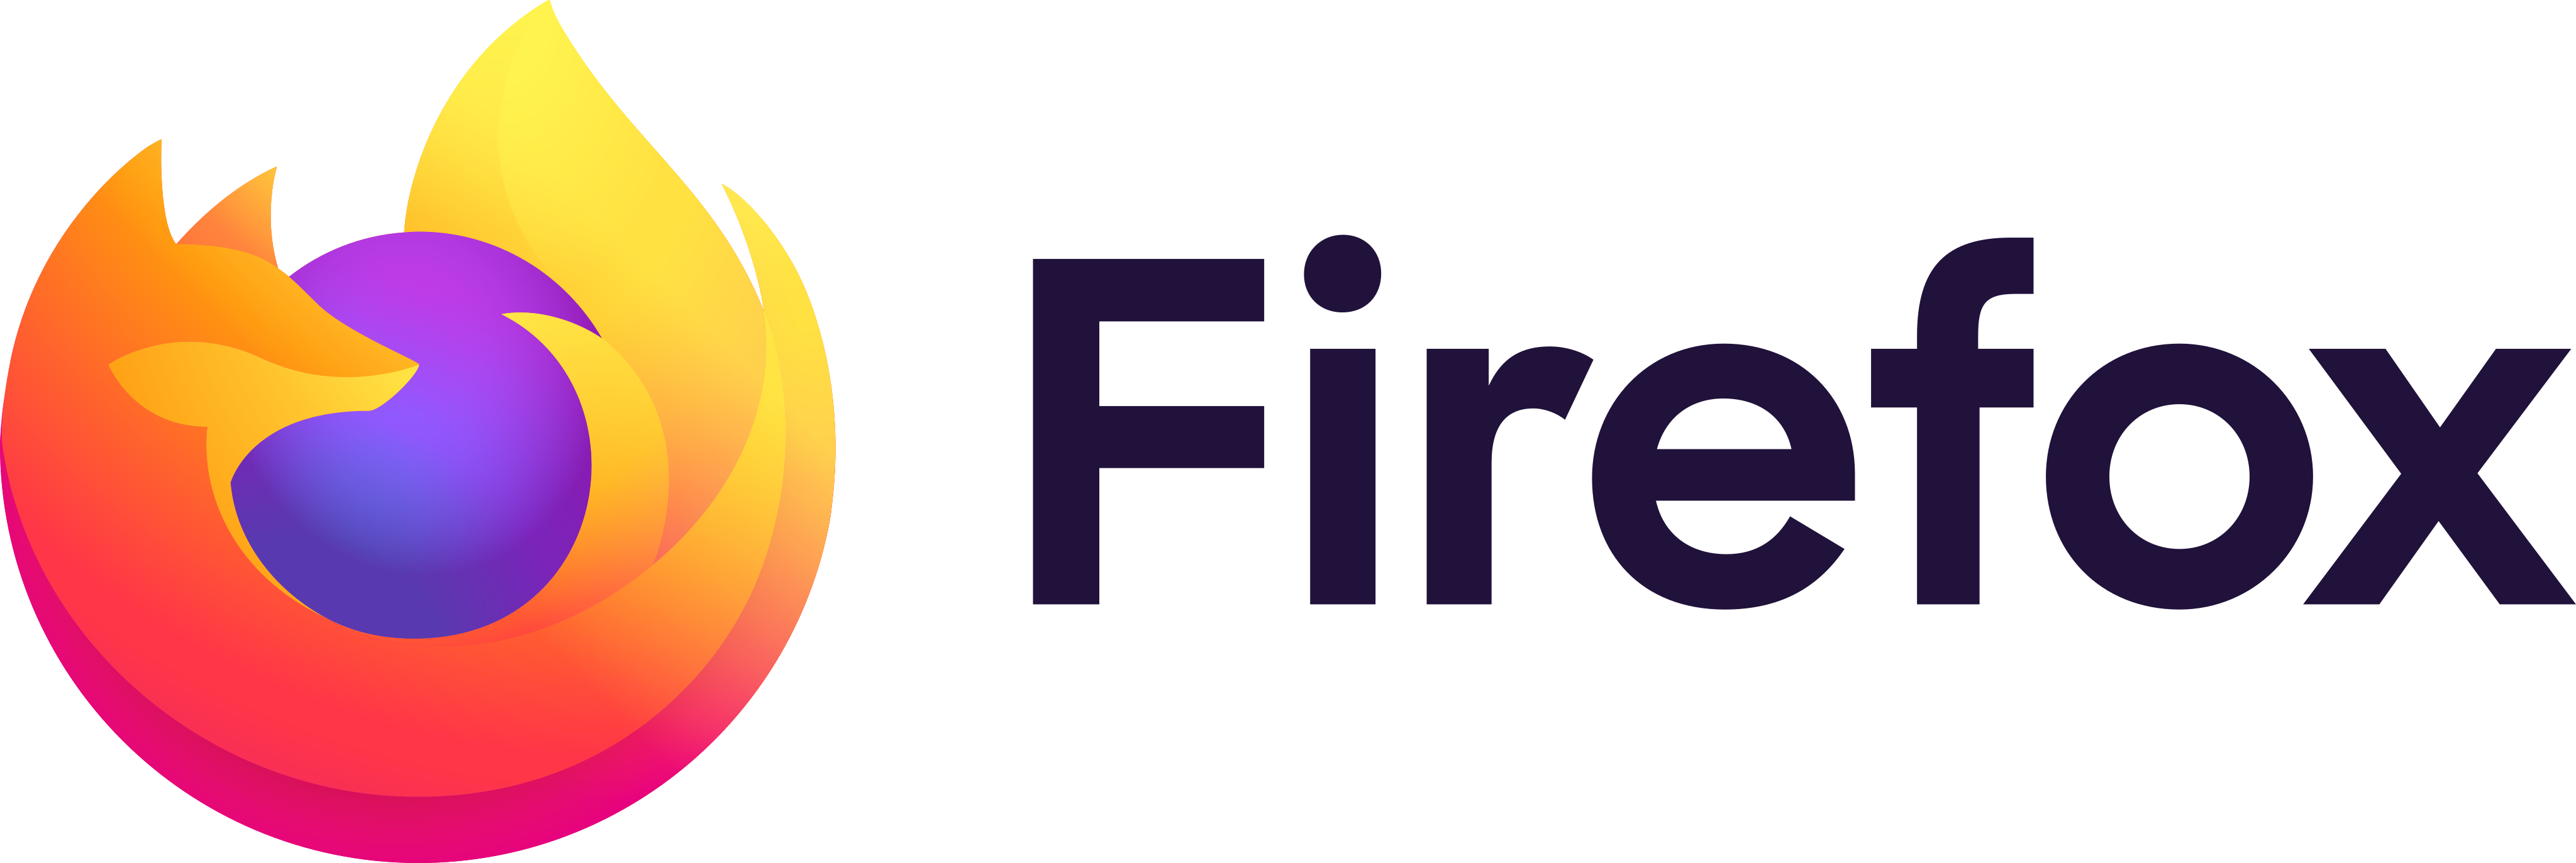 firefox logo - Firefox Logo